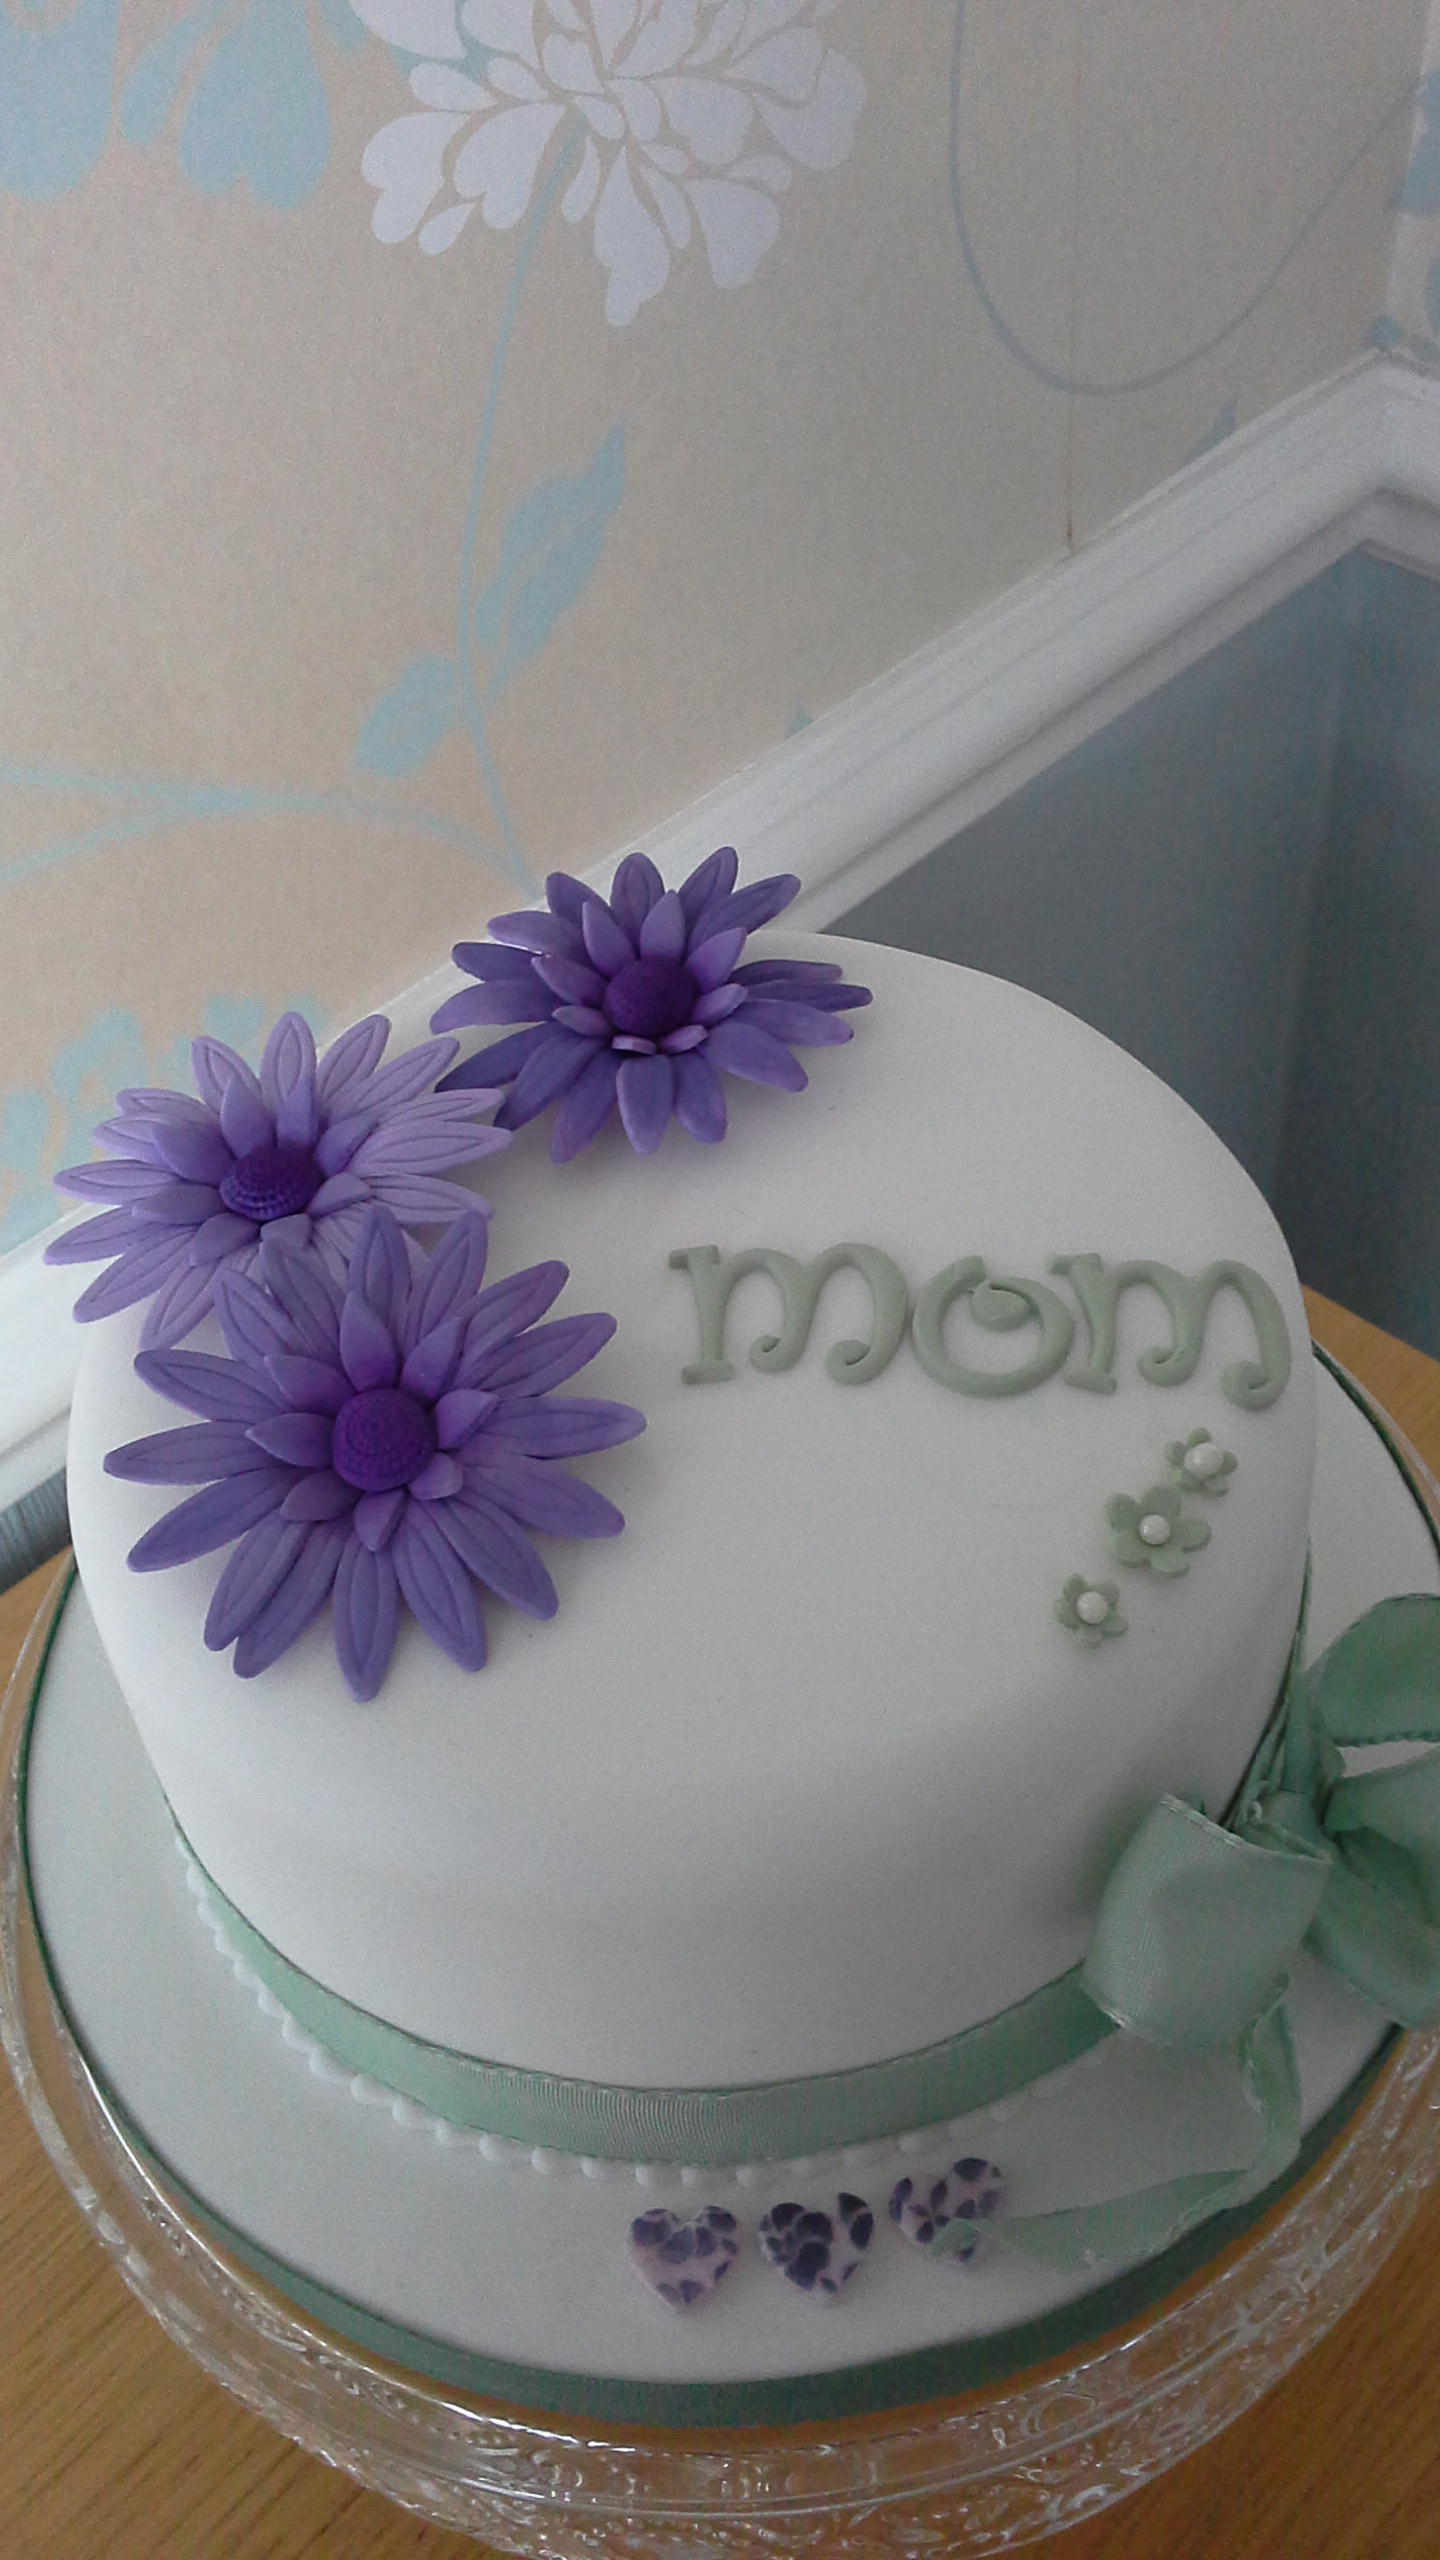 Ough What a Cake 3 Birthdays